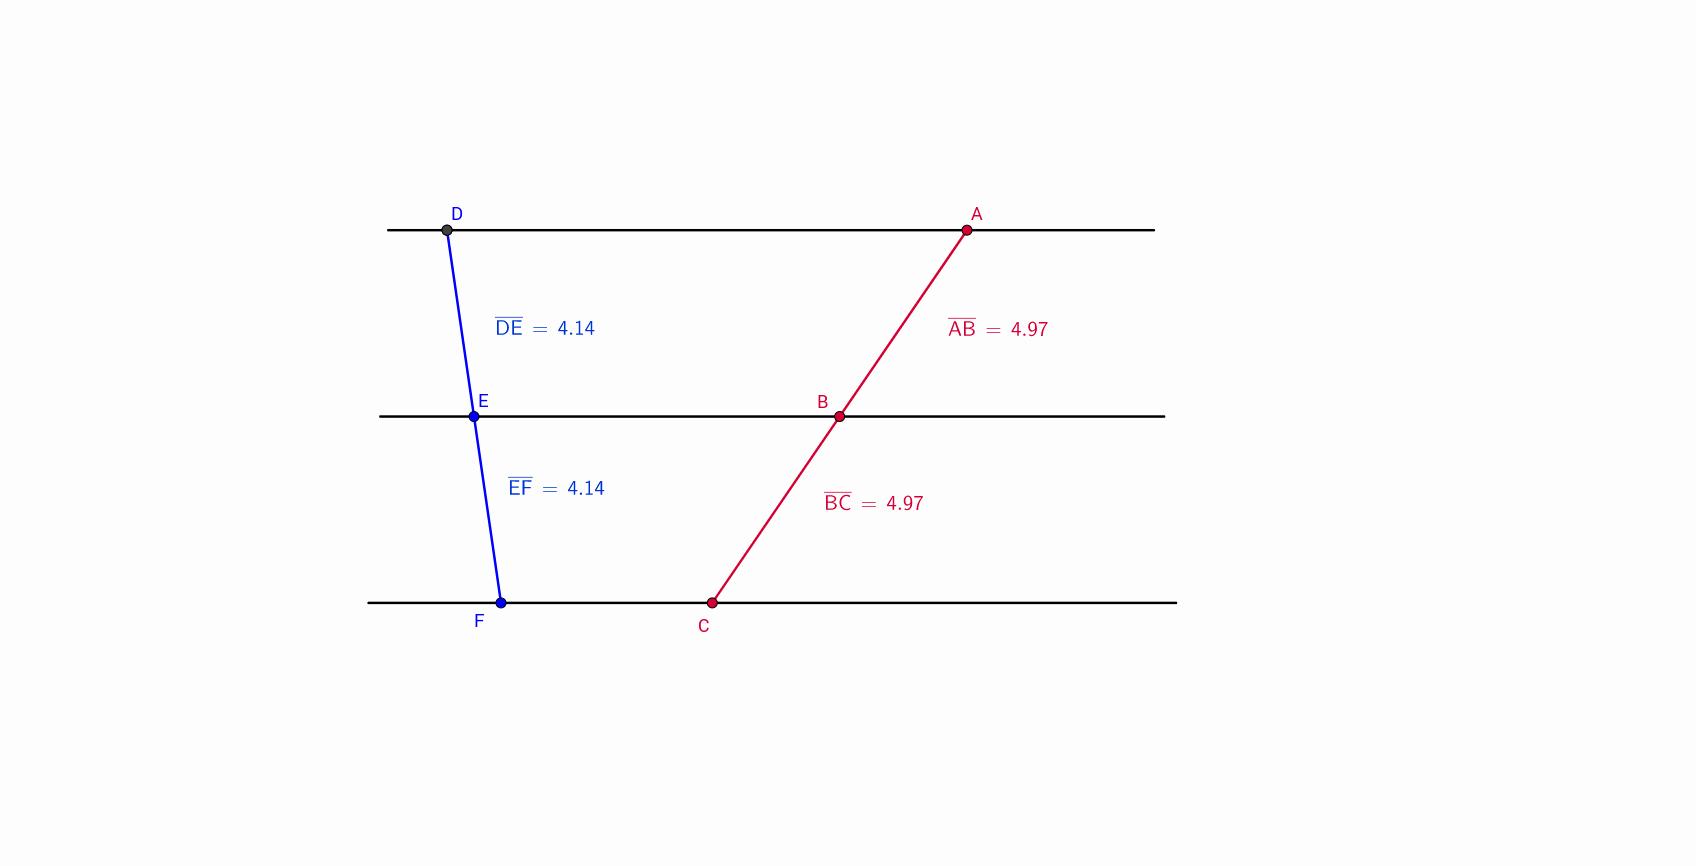 Parallel Lines and Transversals Worksheet Awesome Worksheet Parallel Lines Cut by A Transversal Worksheet